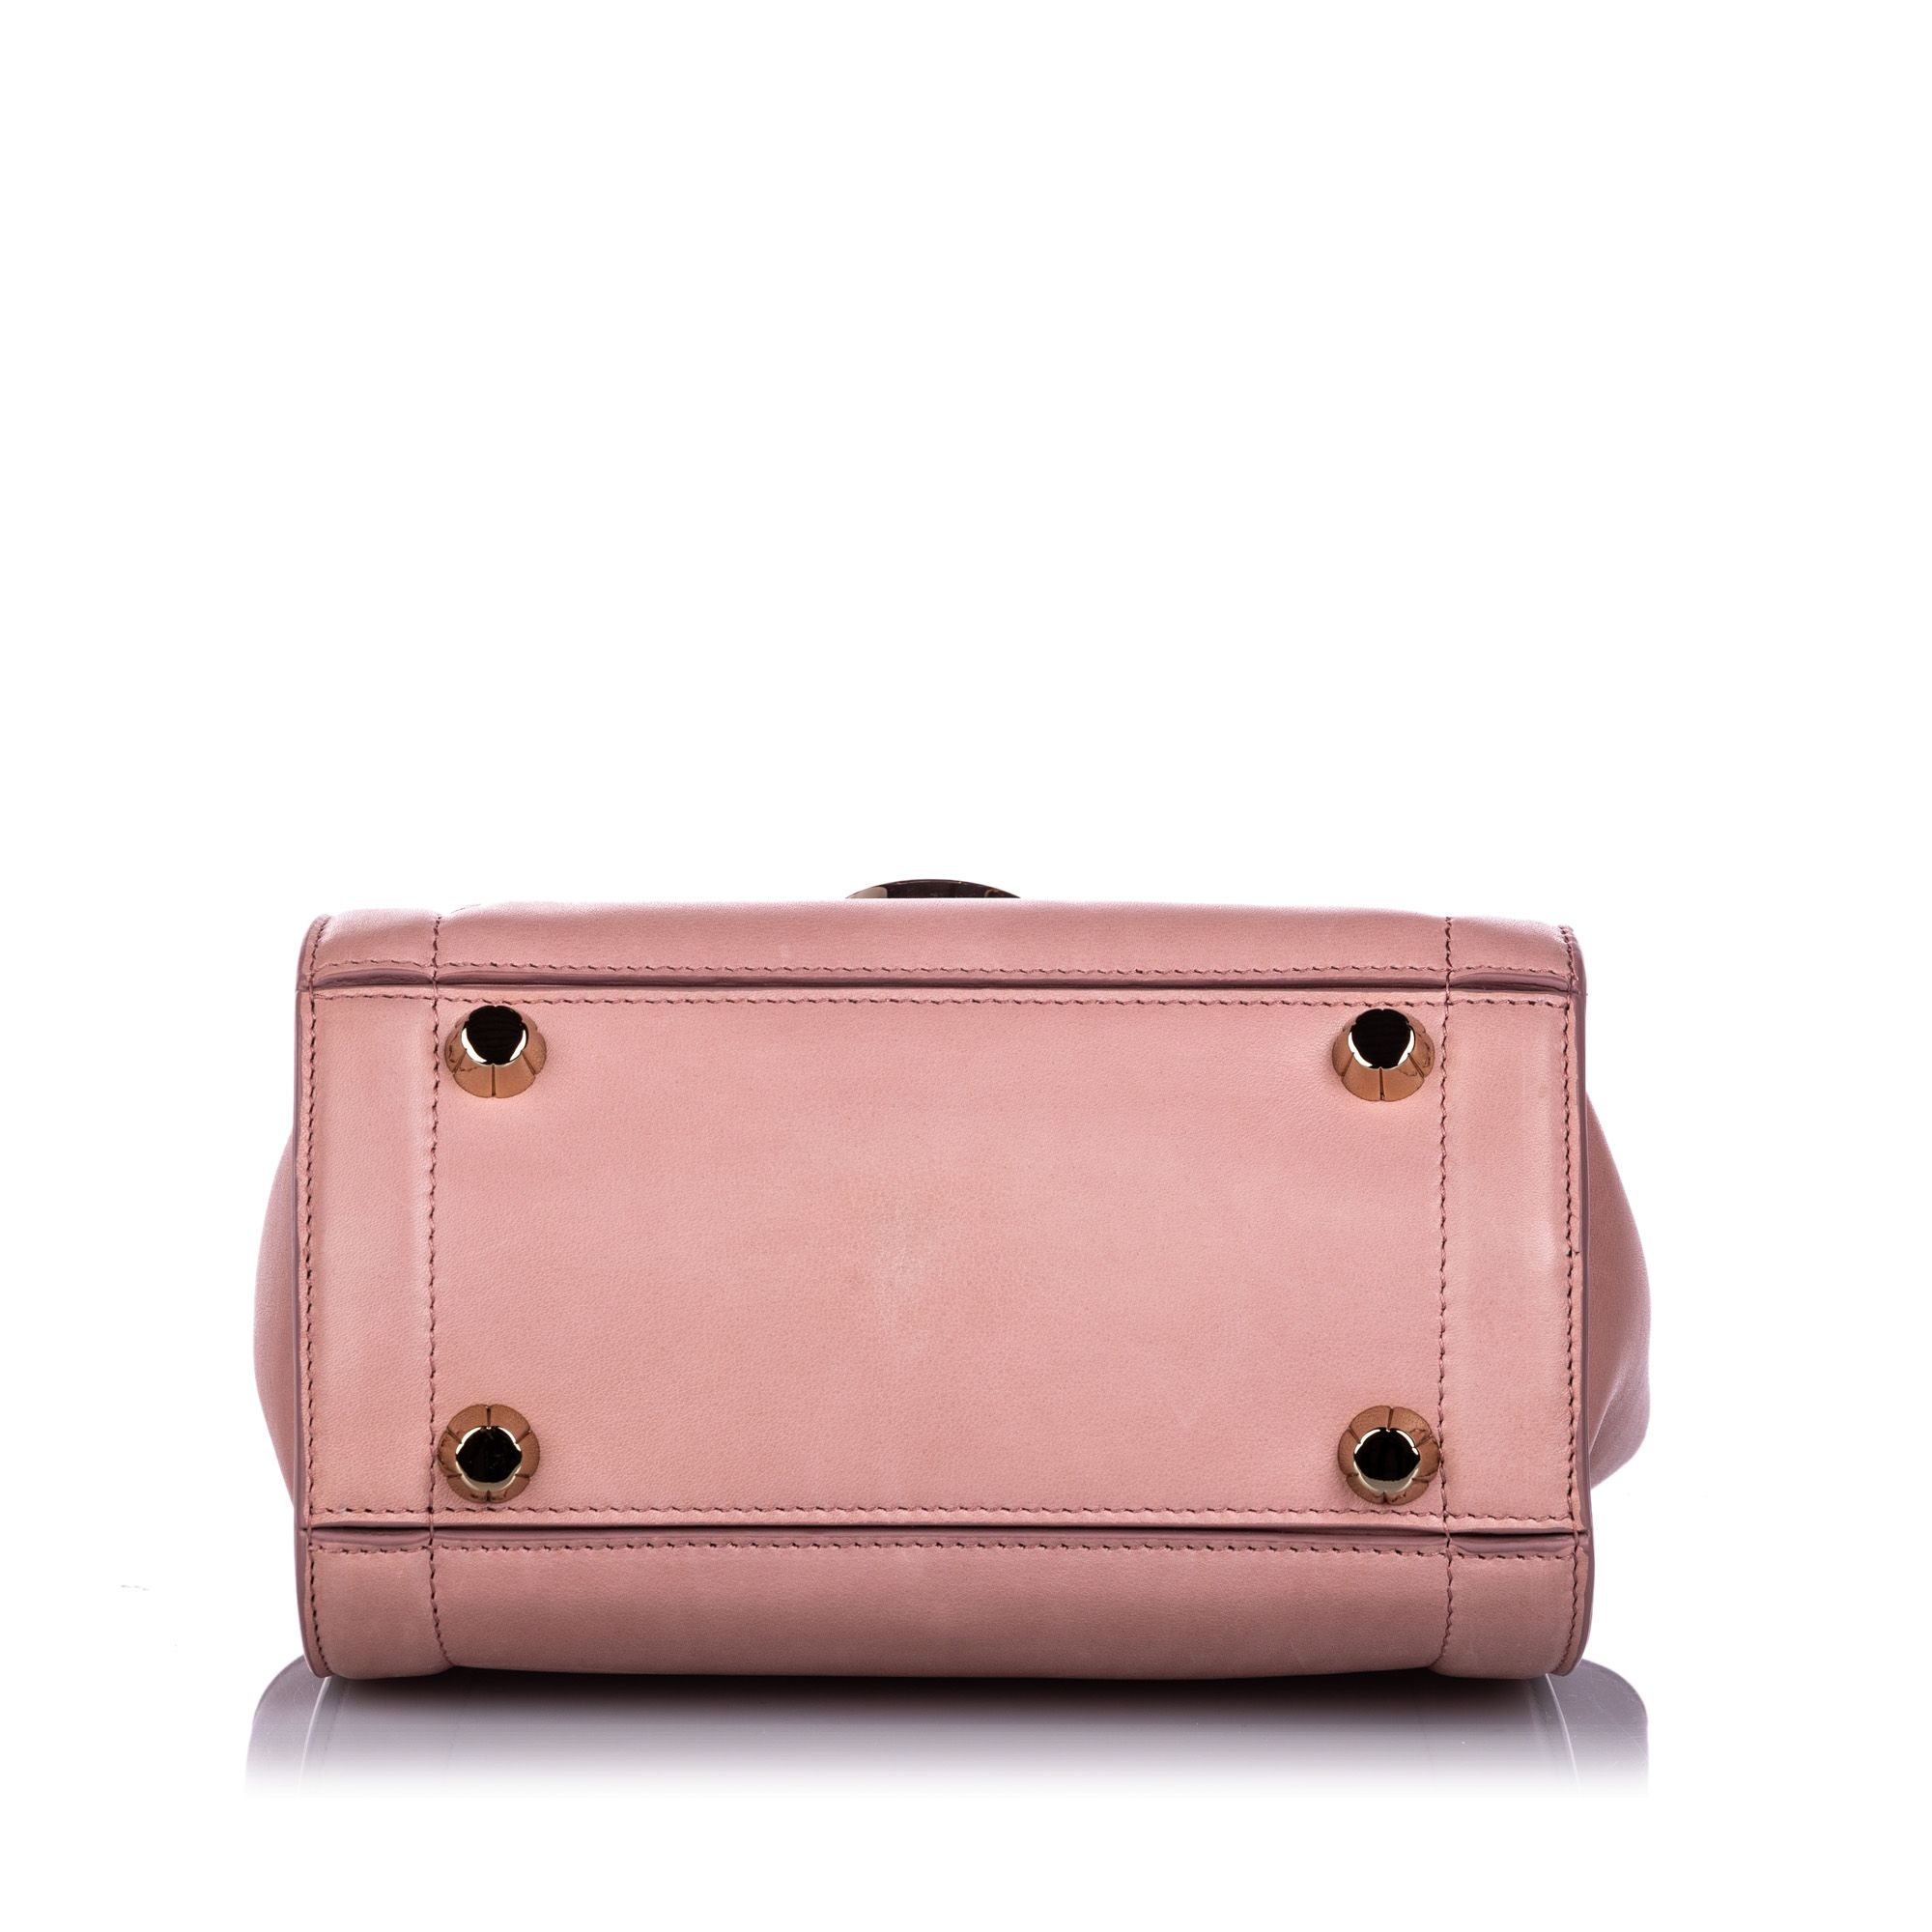 Vintage Ferragamo Calfskin Sofia Rainbow Satchel Pink